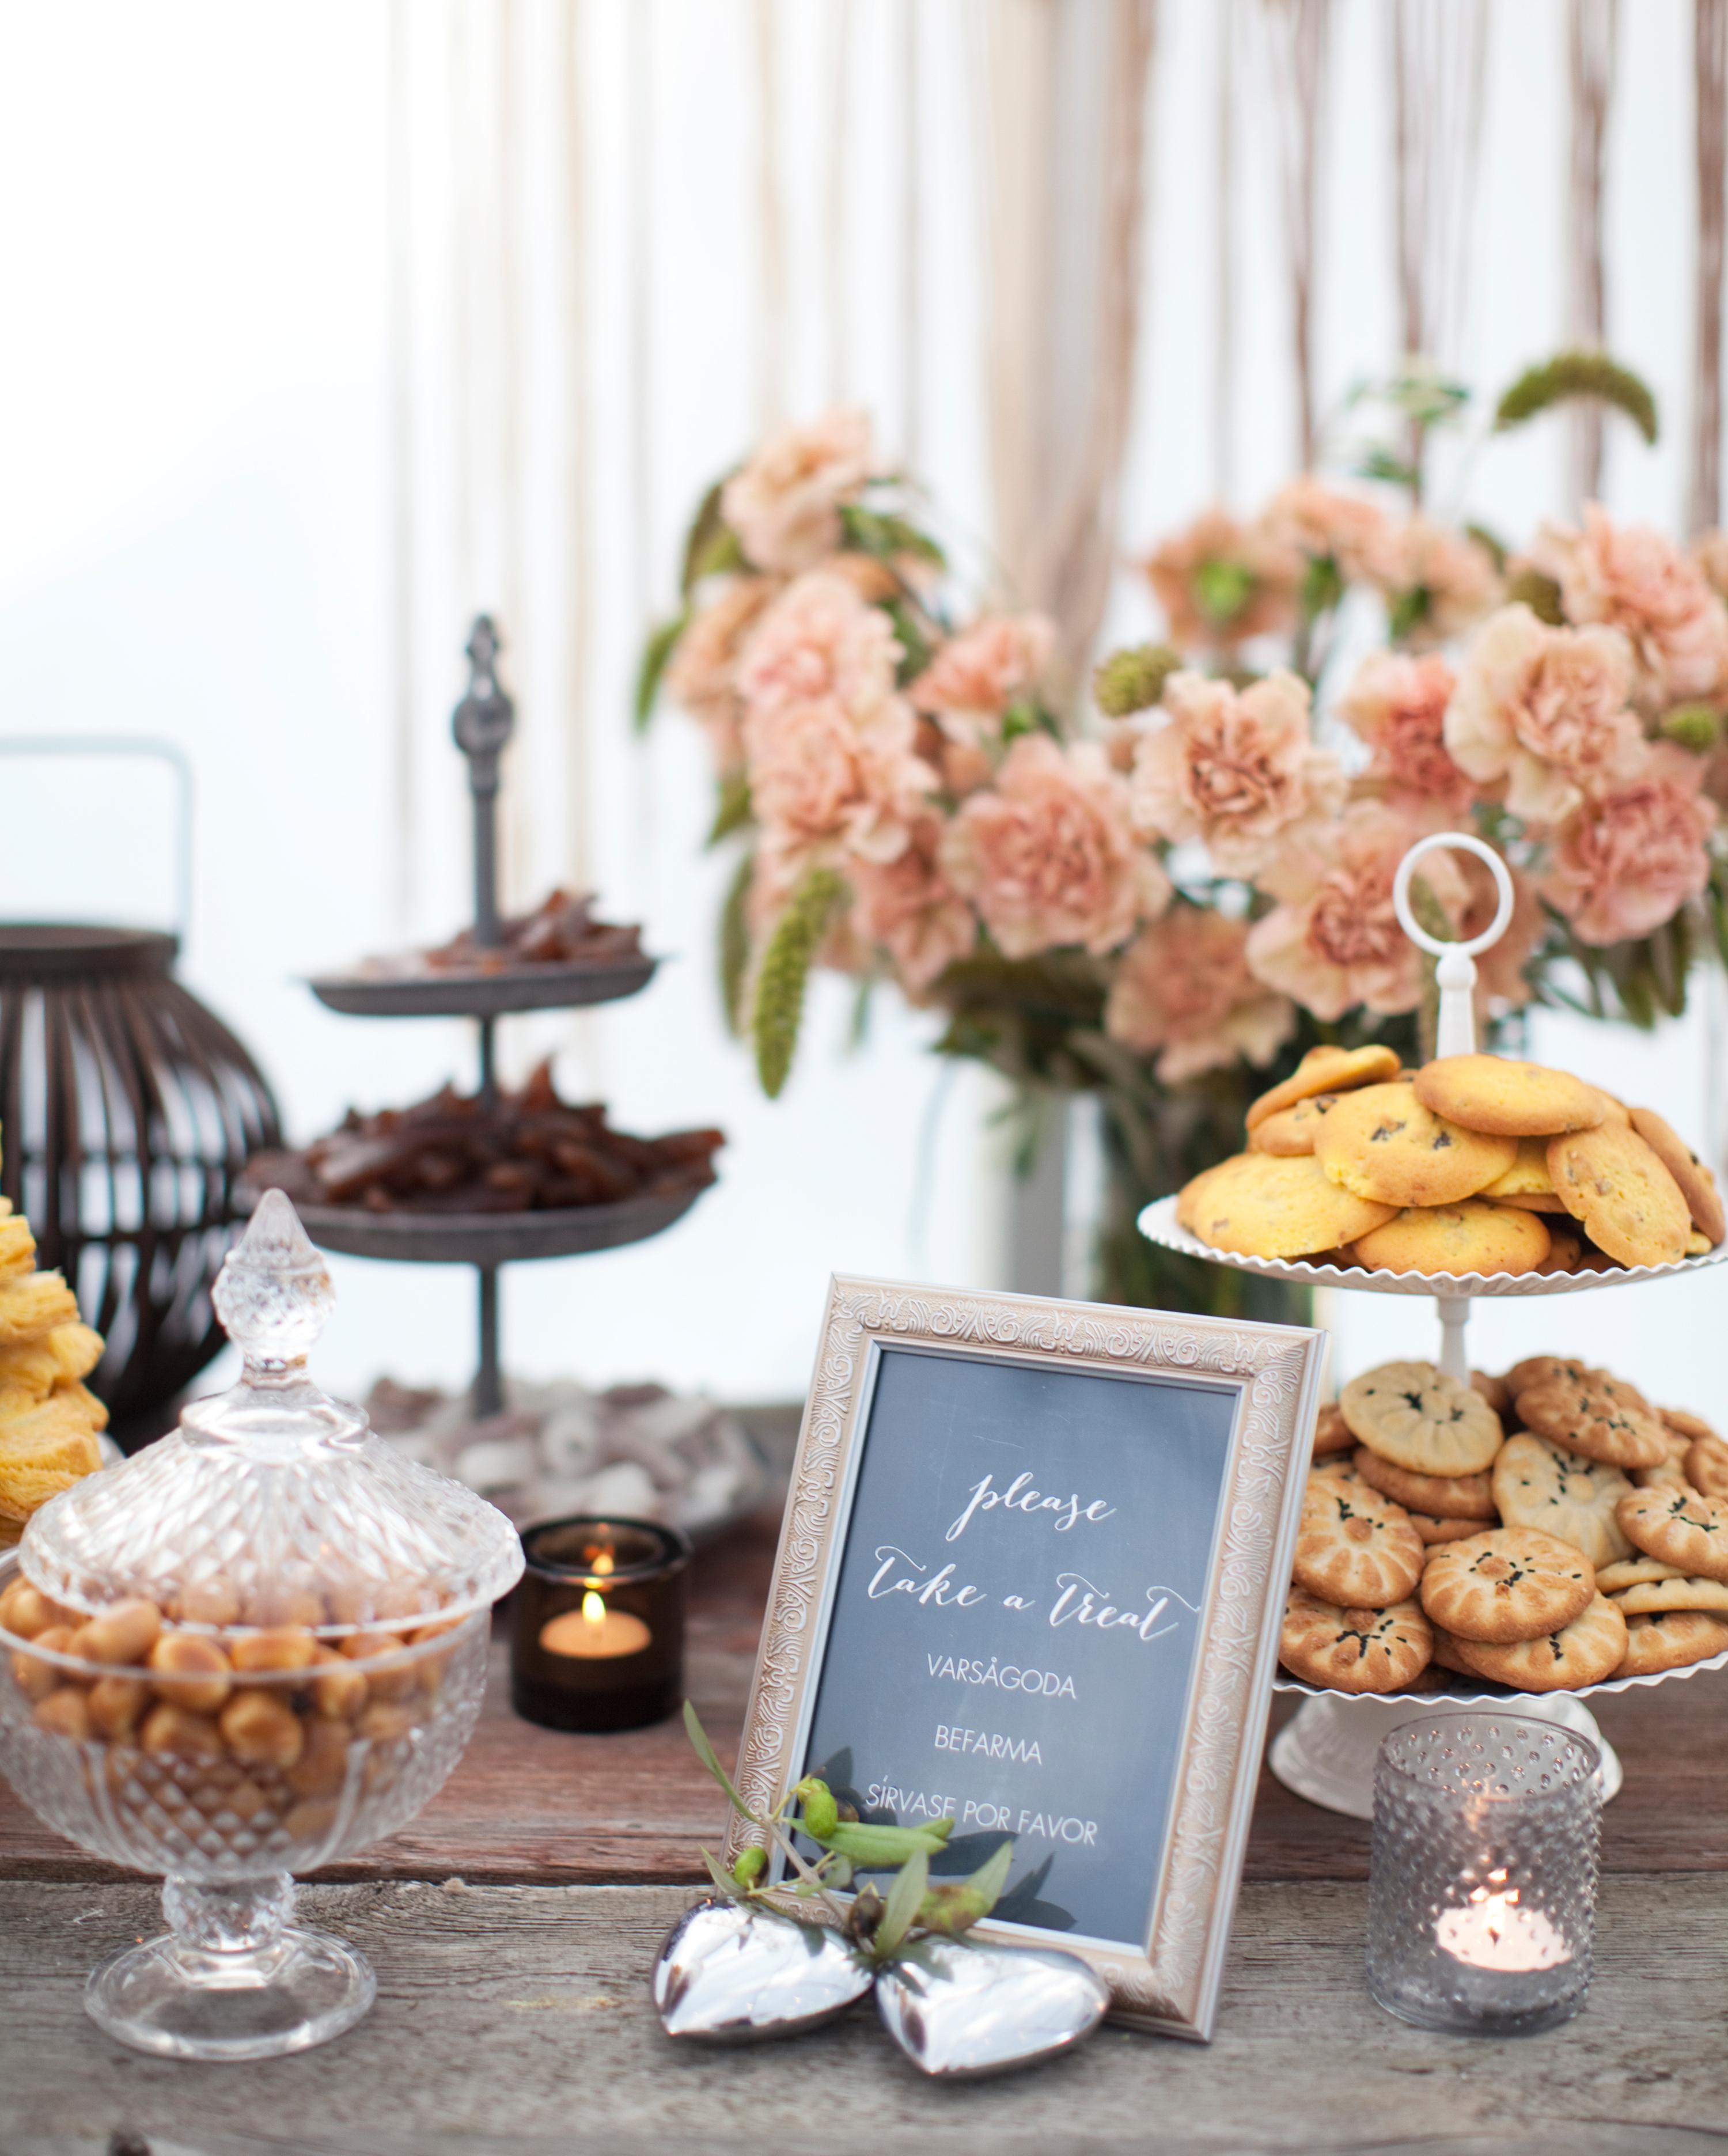 negin-chris-wedding-treats-0550-s112116-0815.jpg